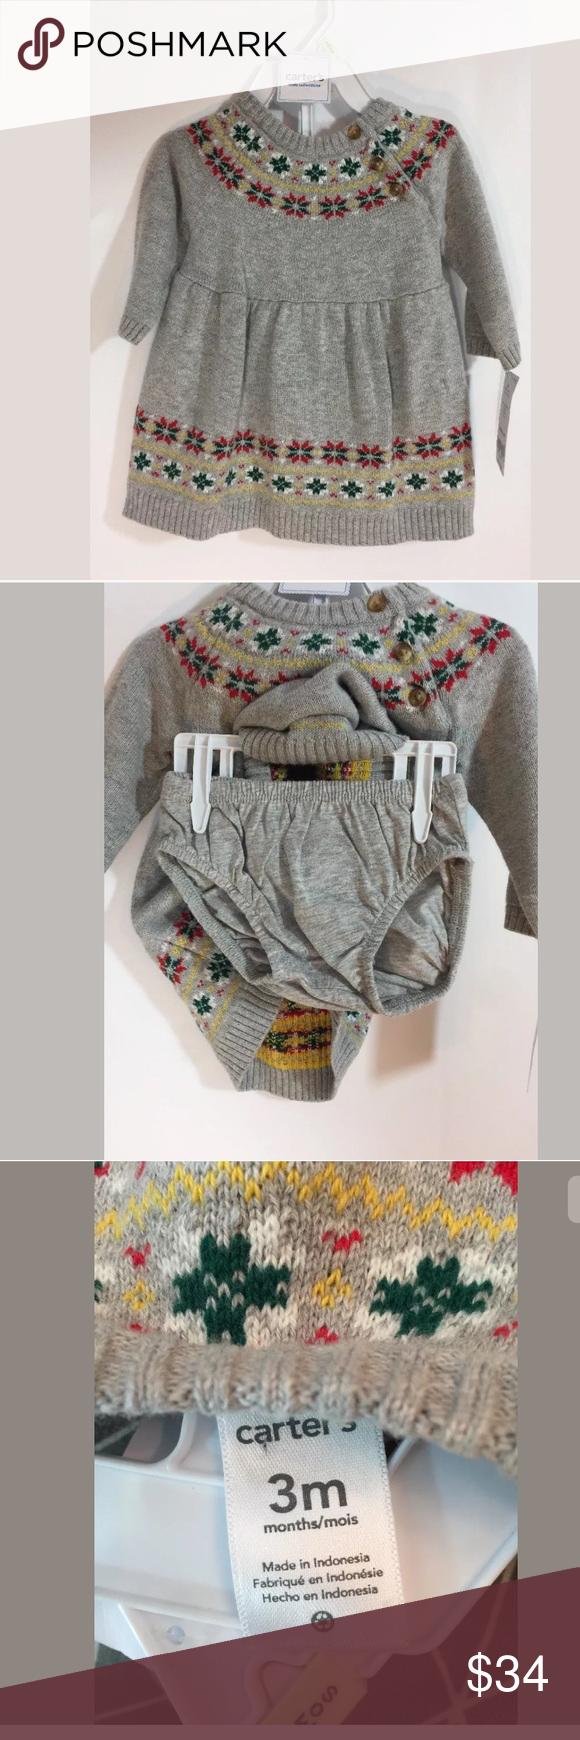 "c78a61c62 Carter's Holiday Sweater Dress Sz 3M NWT Dress is nwt. Length 13 1/2"" Carter's  Dresses"